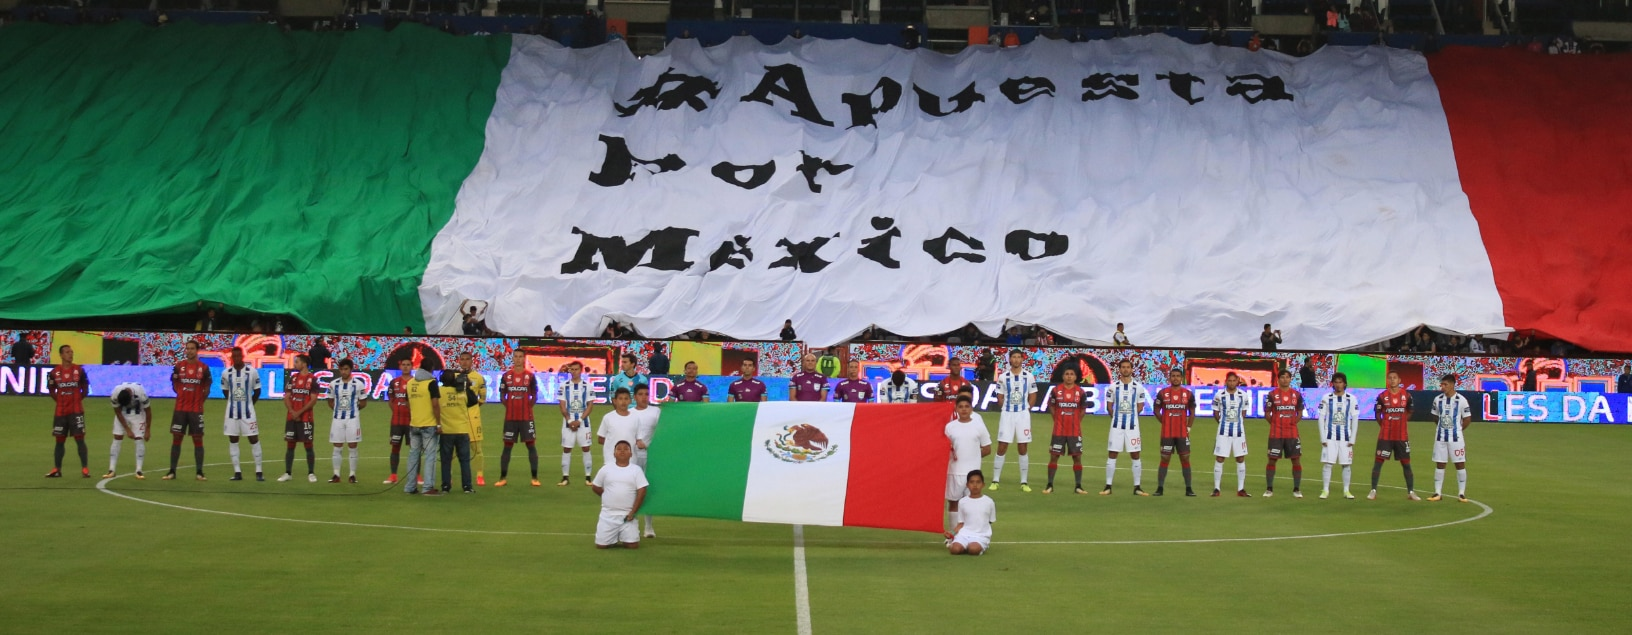 mexico-liga-bancomer-mx-bbva-efe